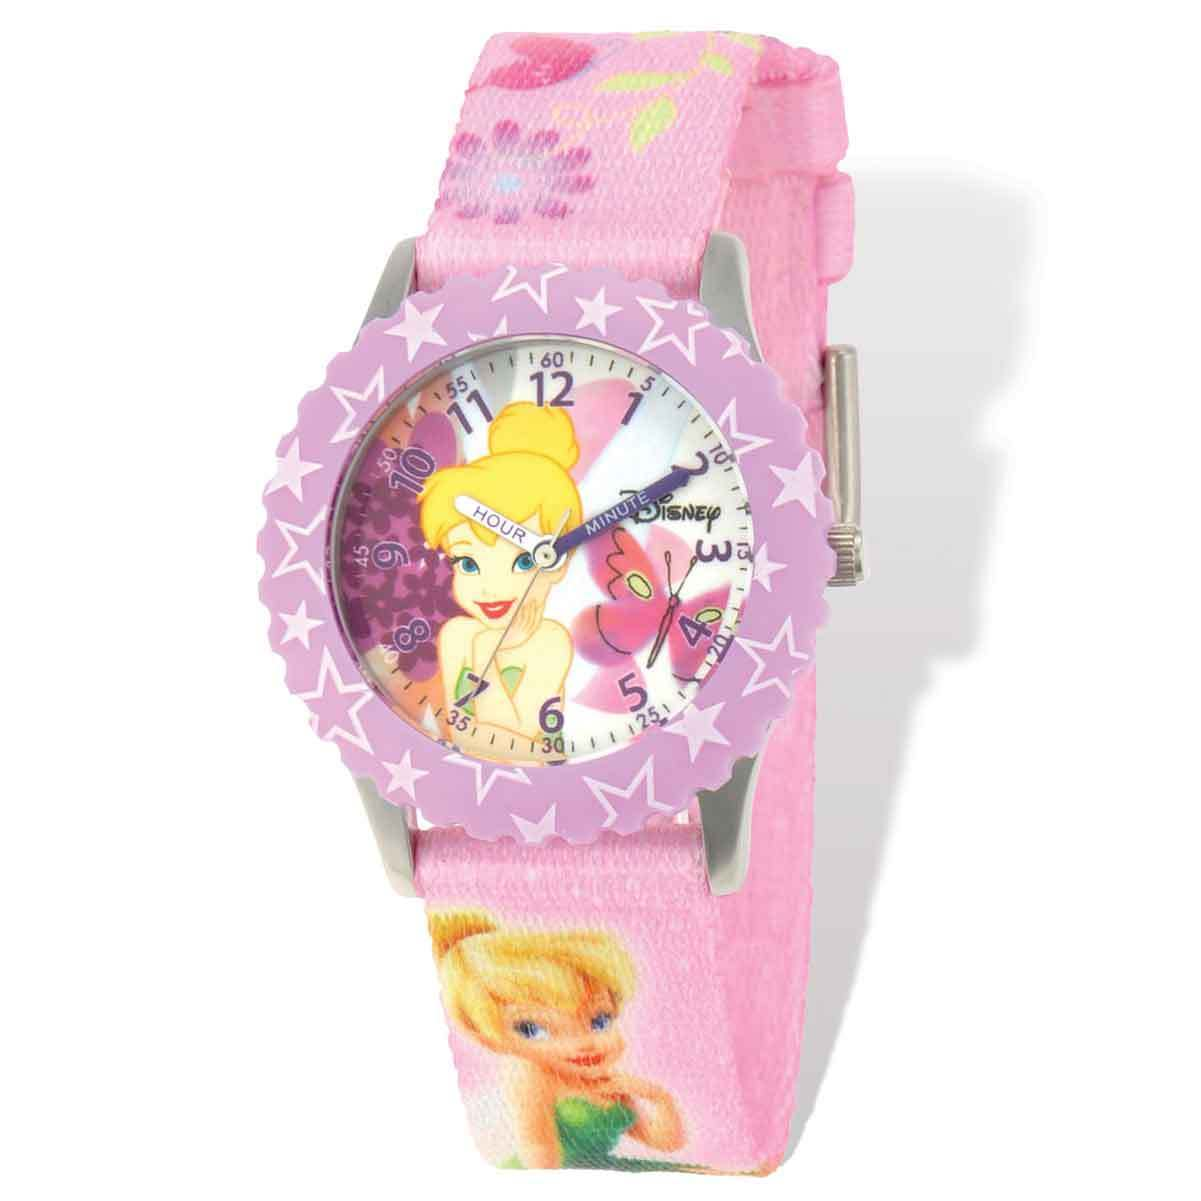 Disney Tinker Bell Printed Pink Fabric Time Teacher Watch...